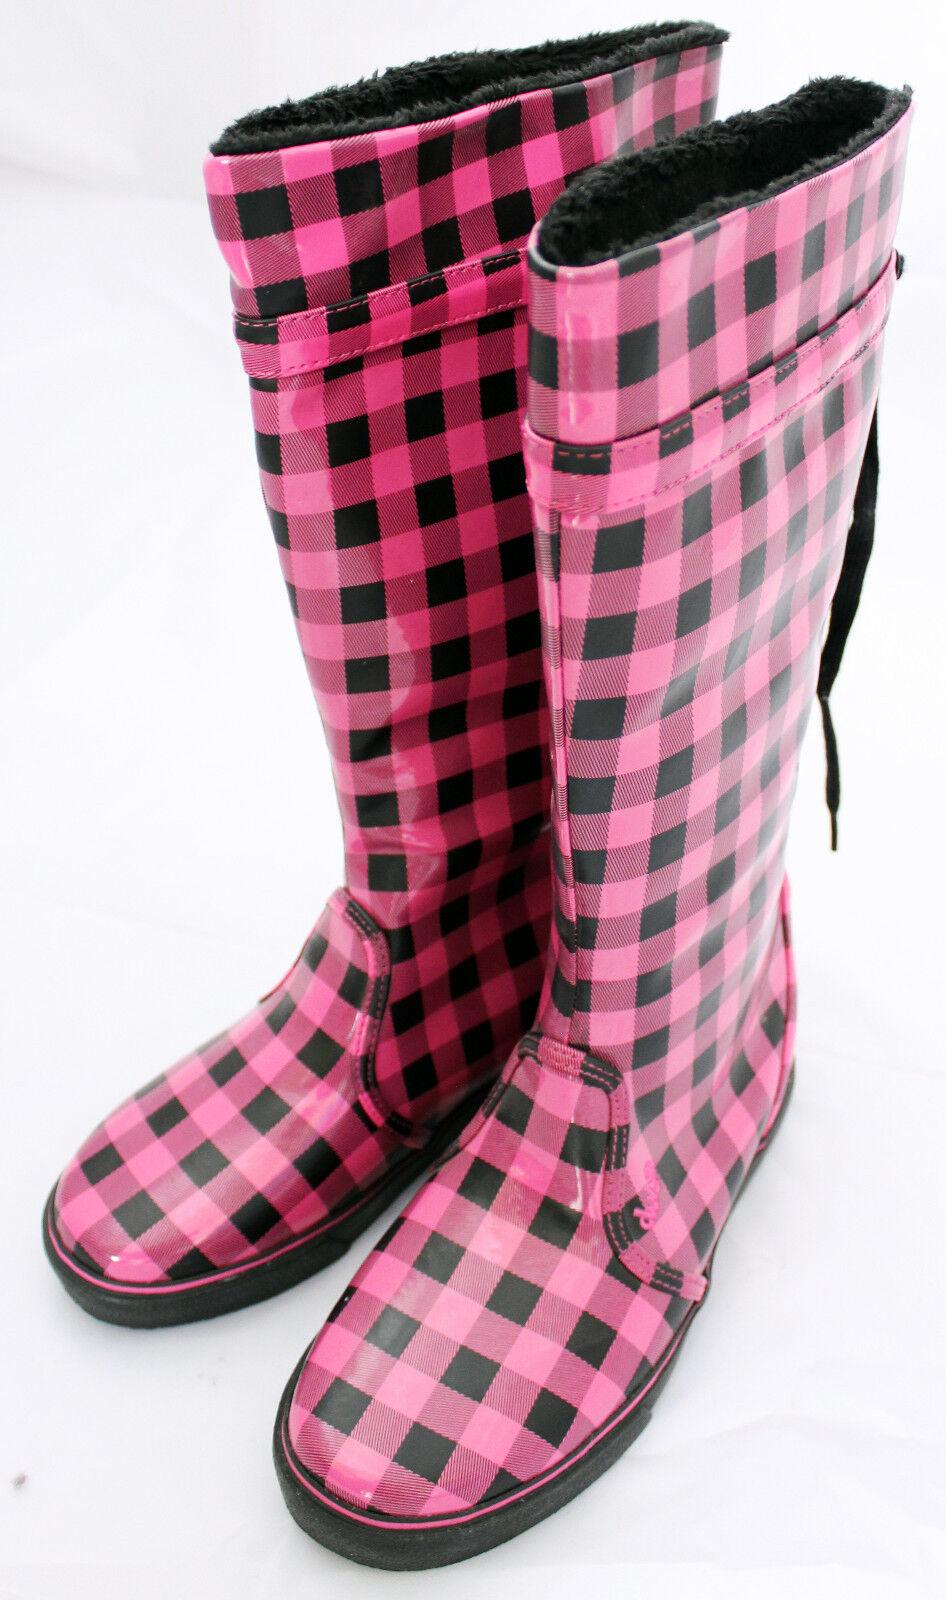 varie dimensioni DVS DVS DVS savannah donna rosa plaid stivali donna lucidi Donna stivali scarpe _  prezzo all'ingrosso e qualità affidabile